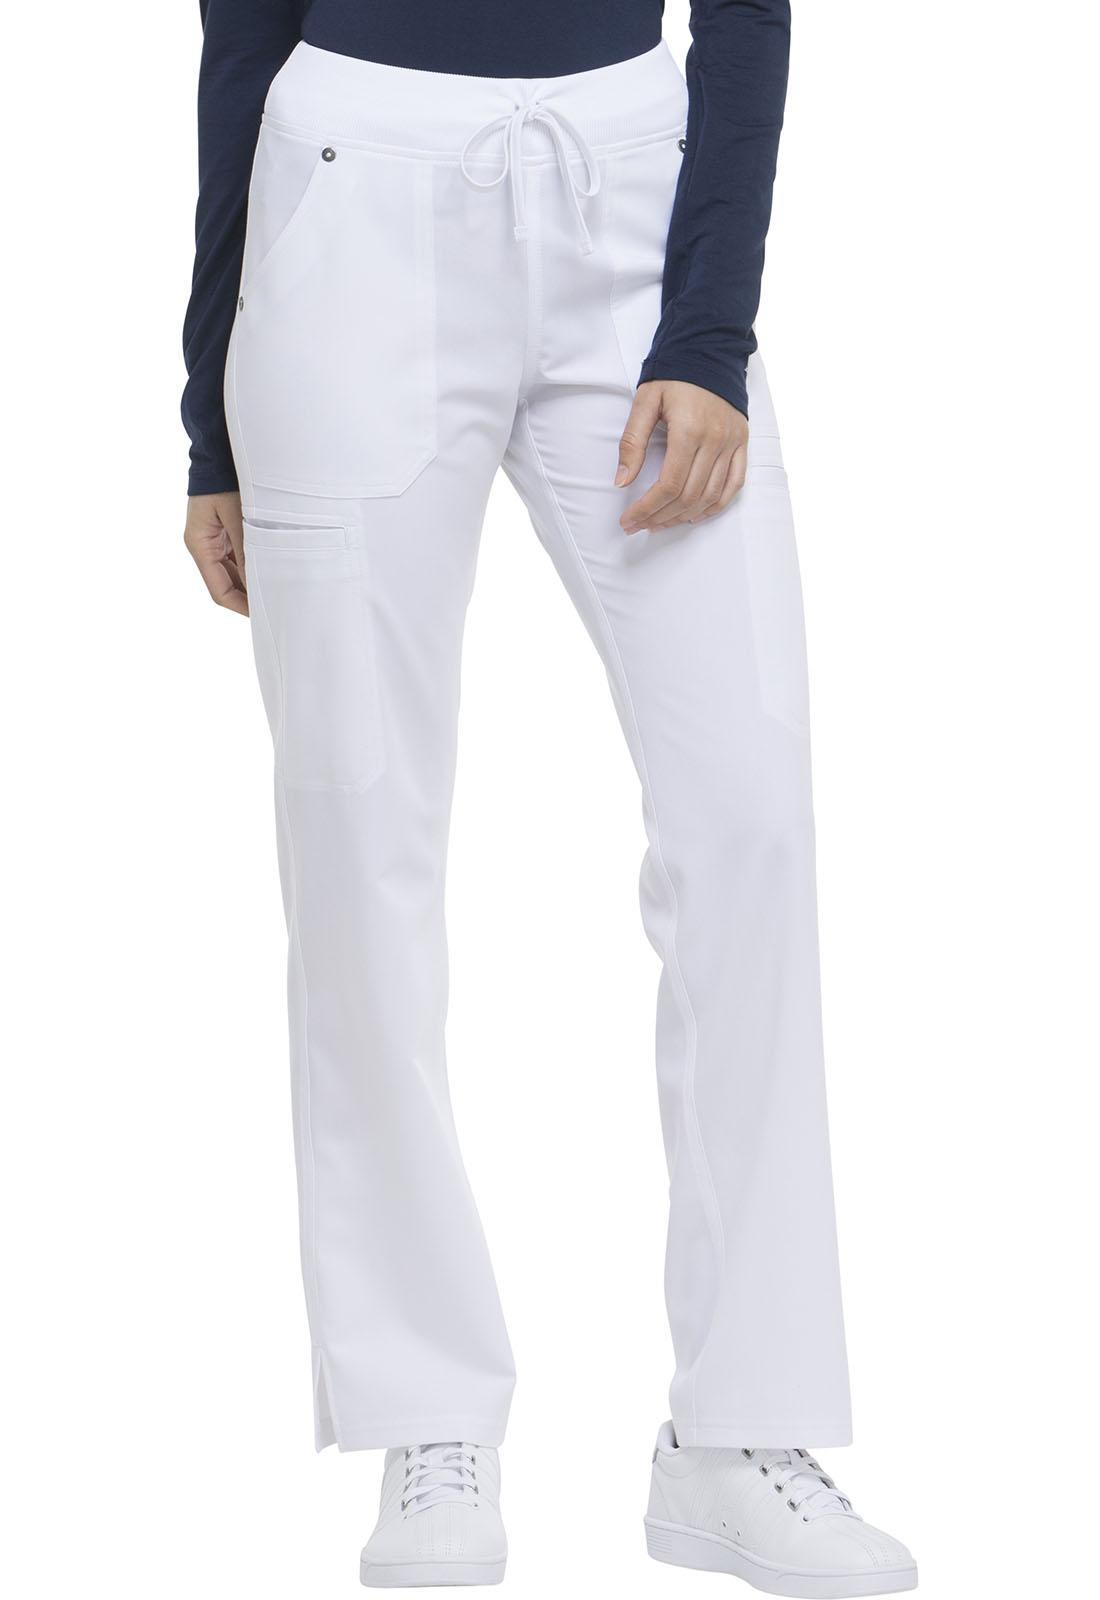 27b4ed6d1cd Xtreme Stretch Mid Rise Rib Knit Waistband Pant in White DK020P-DWHZ ...